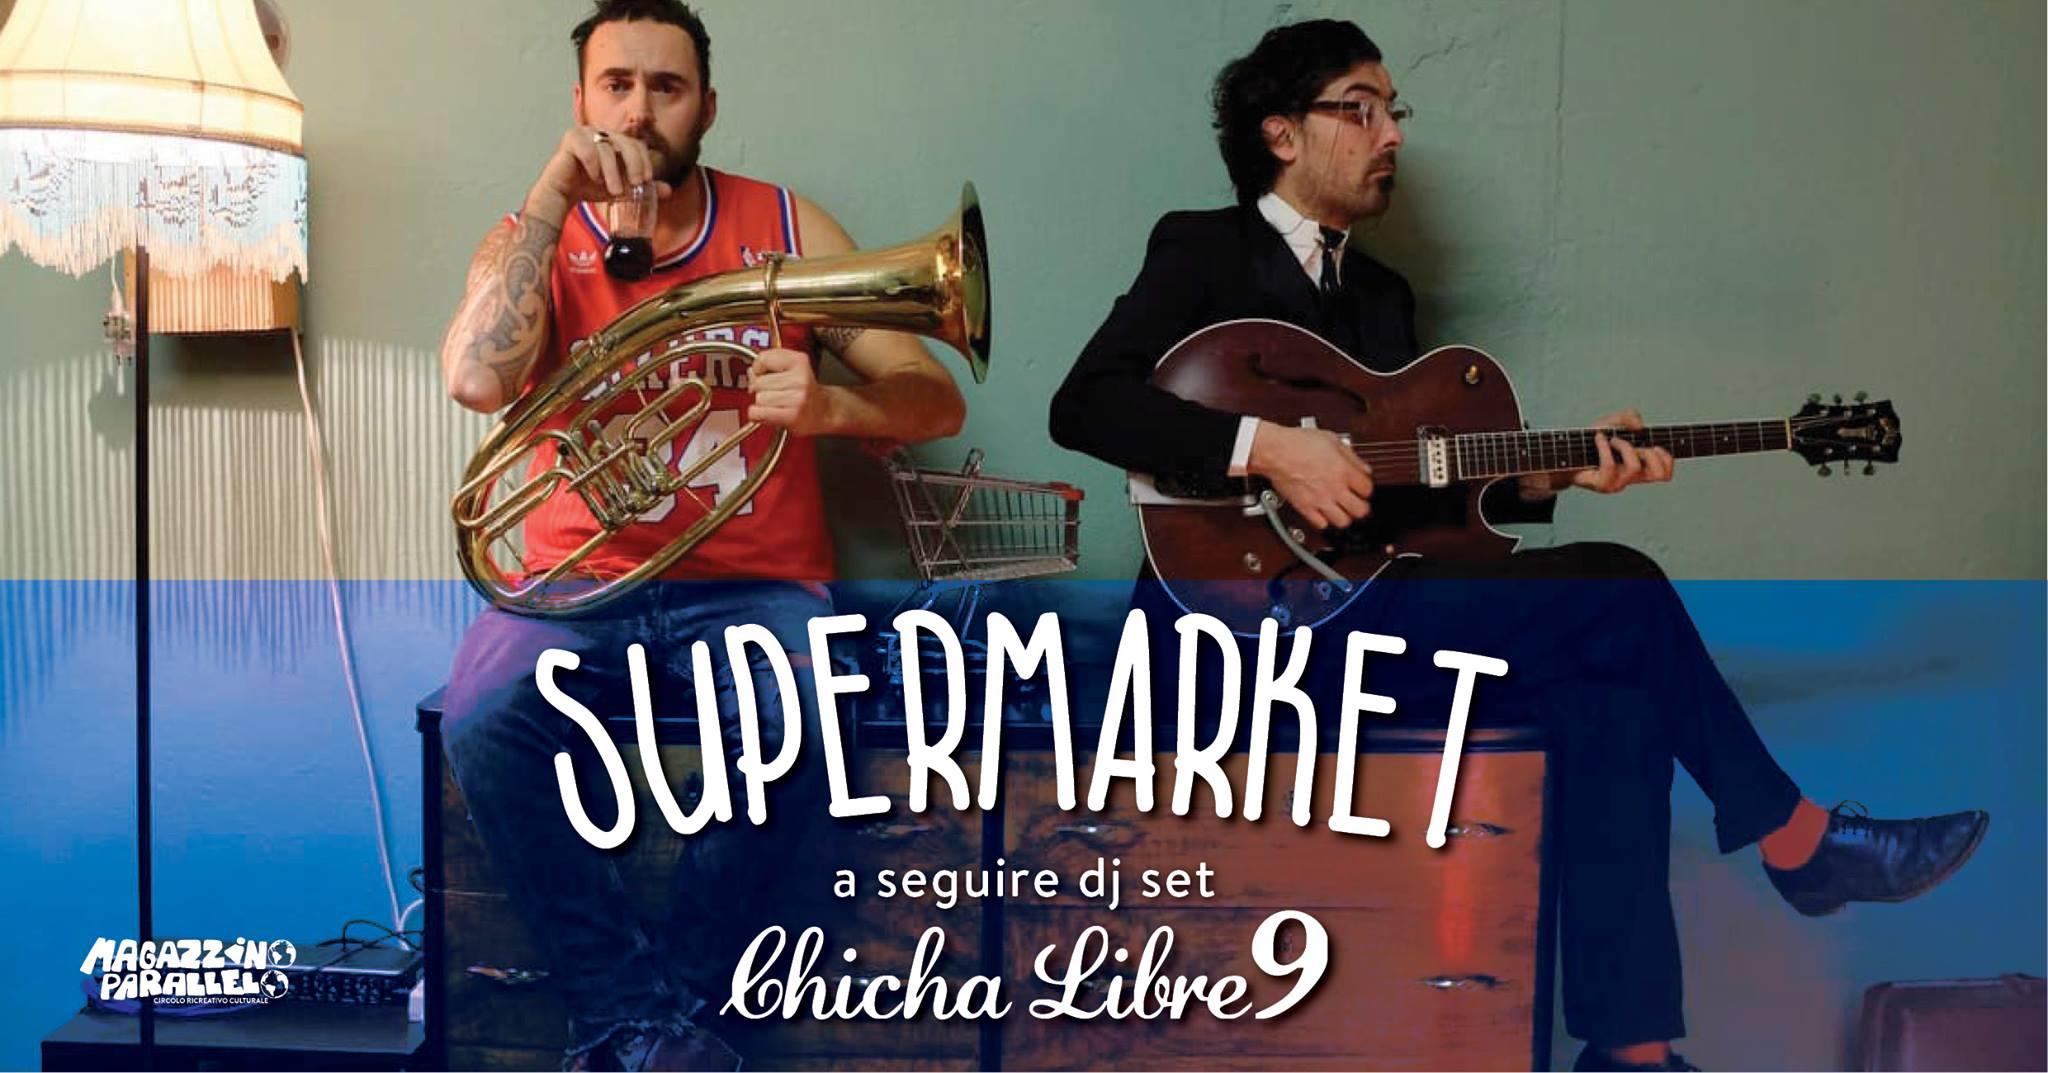 Supermarket / Chicha Libre 9 / at Magazzino Parallelo